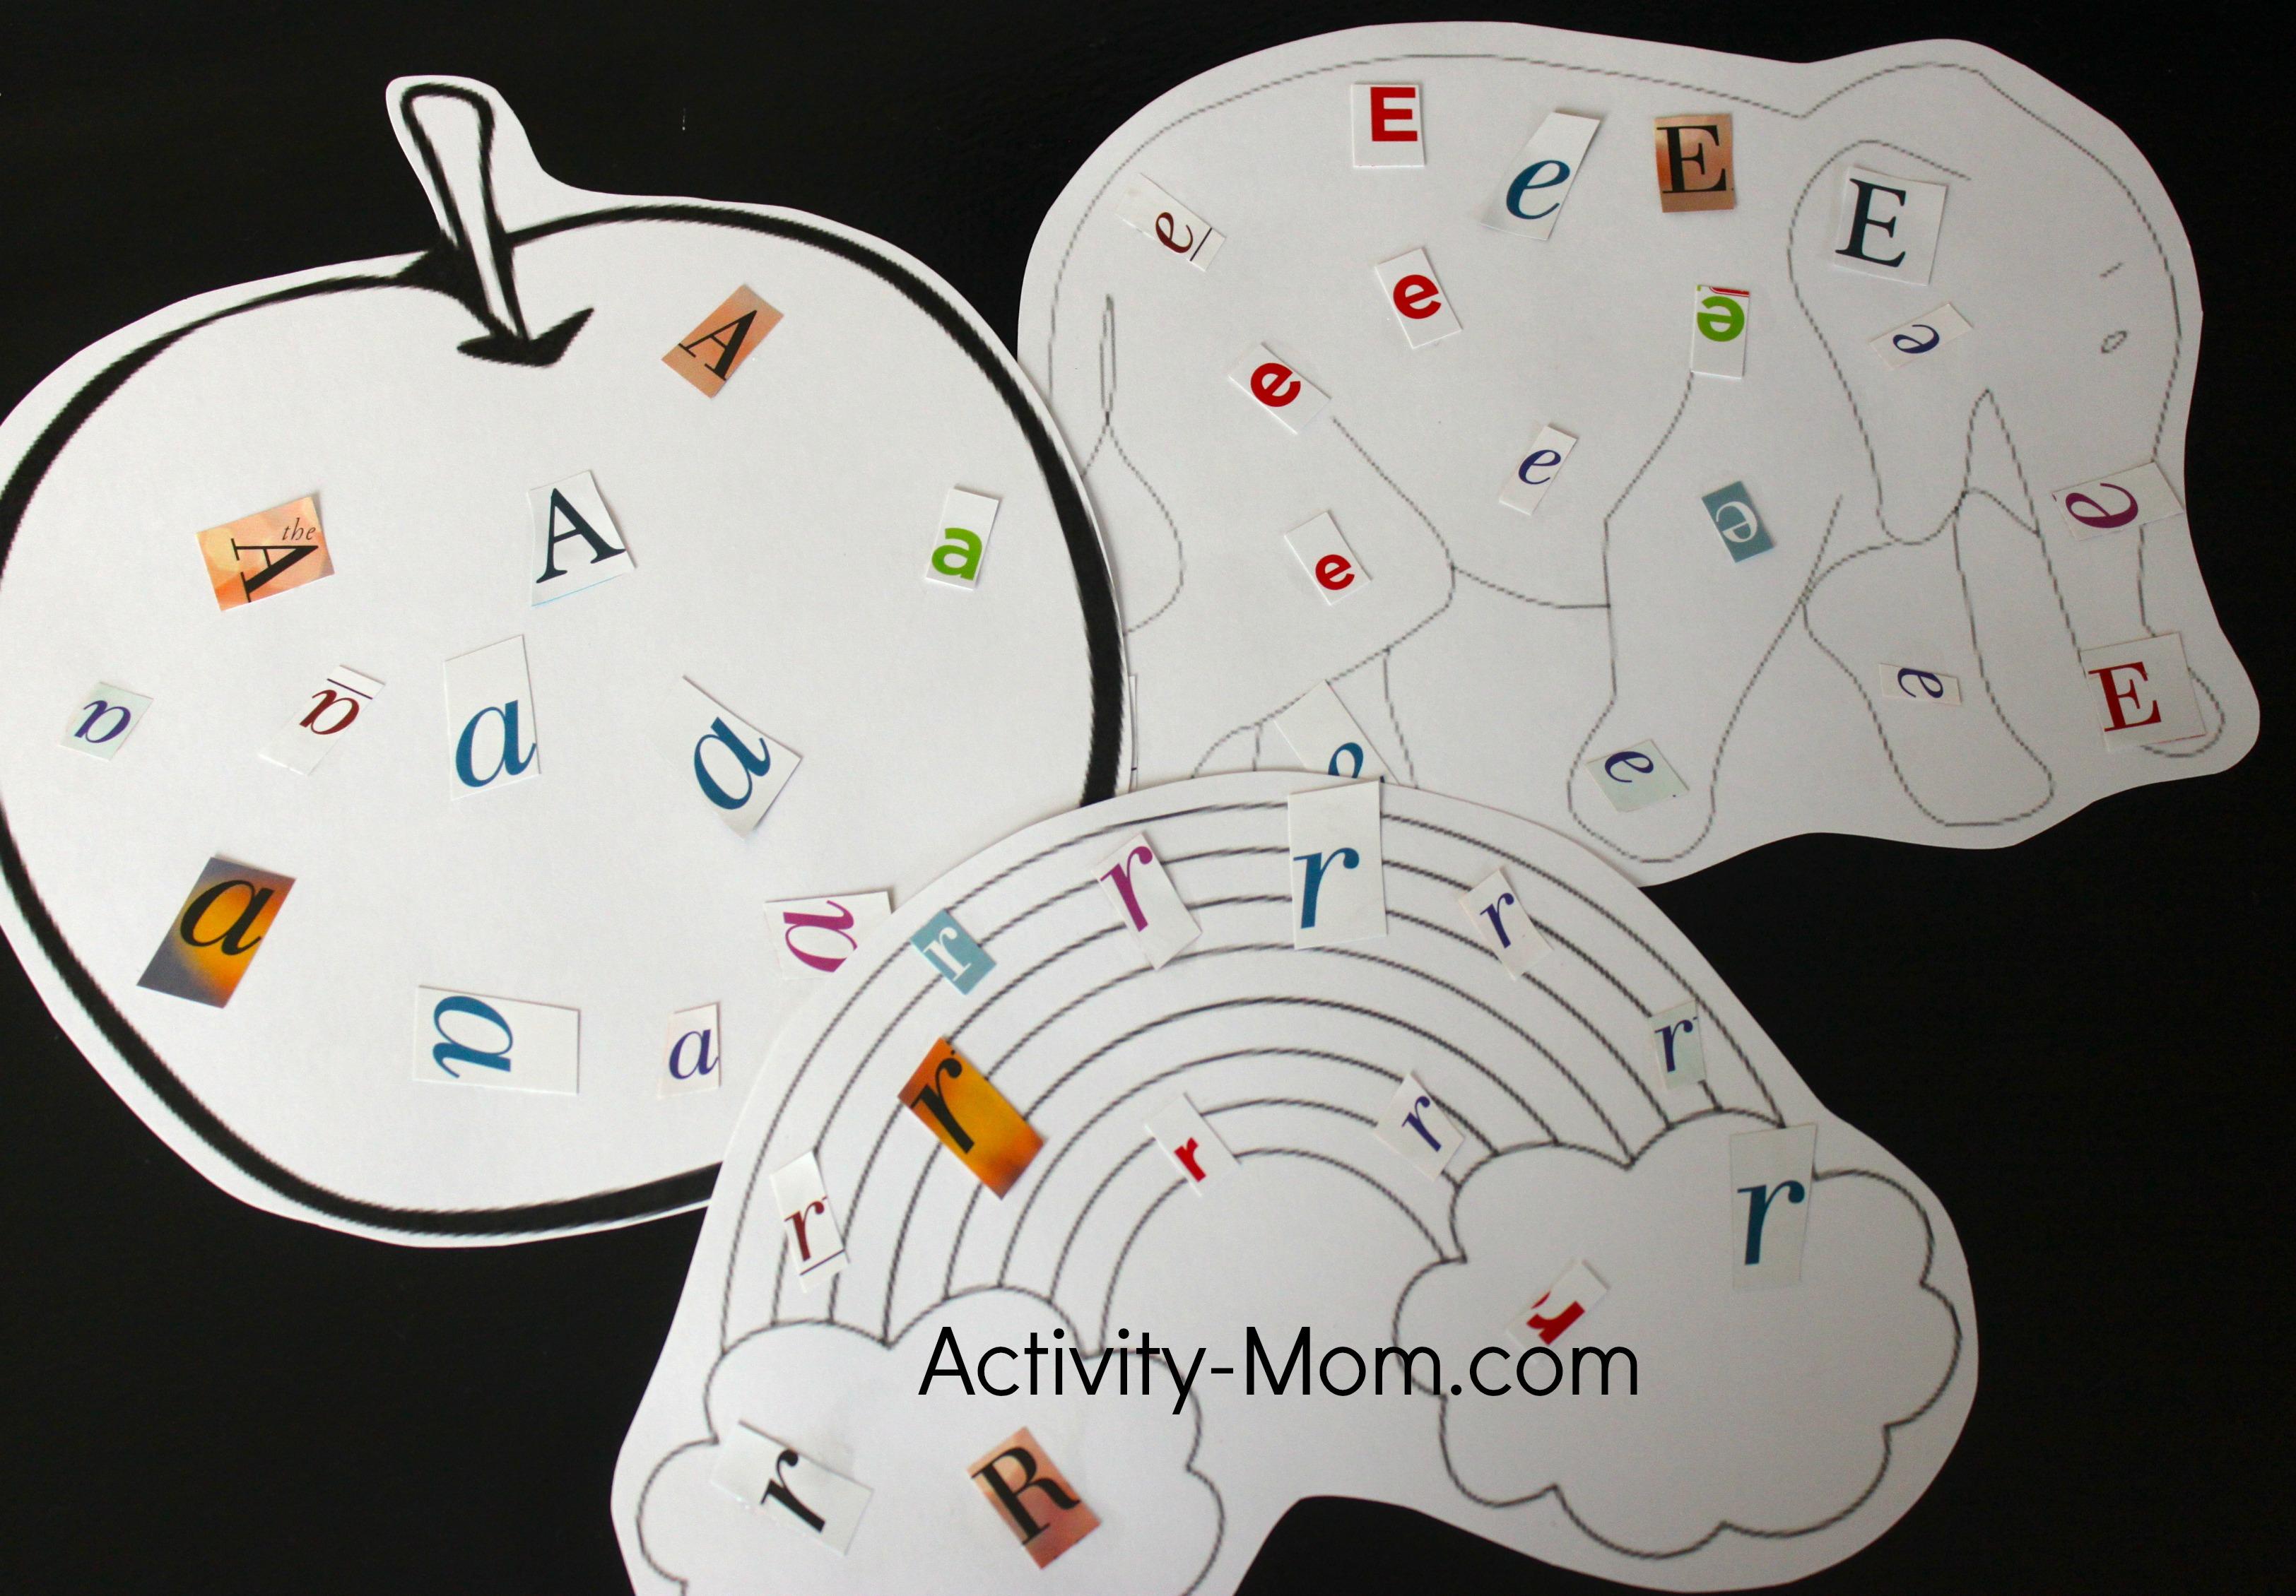 The activity mom alphabet crafts - Putting together stylish kitchen abcs ...